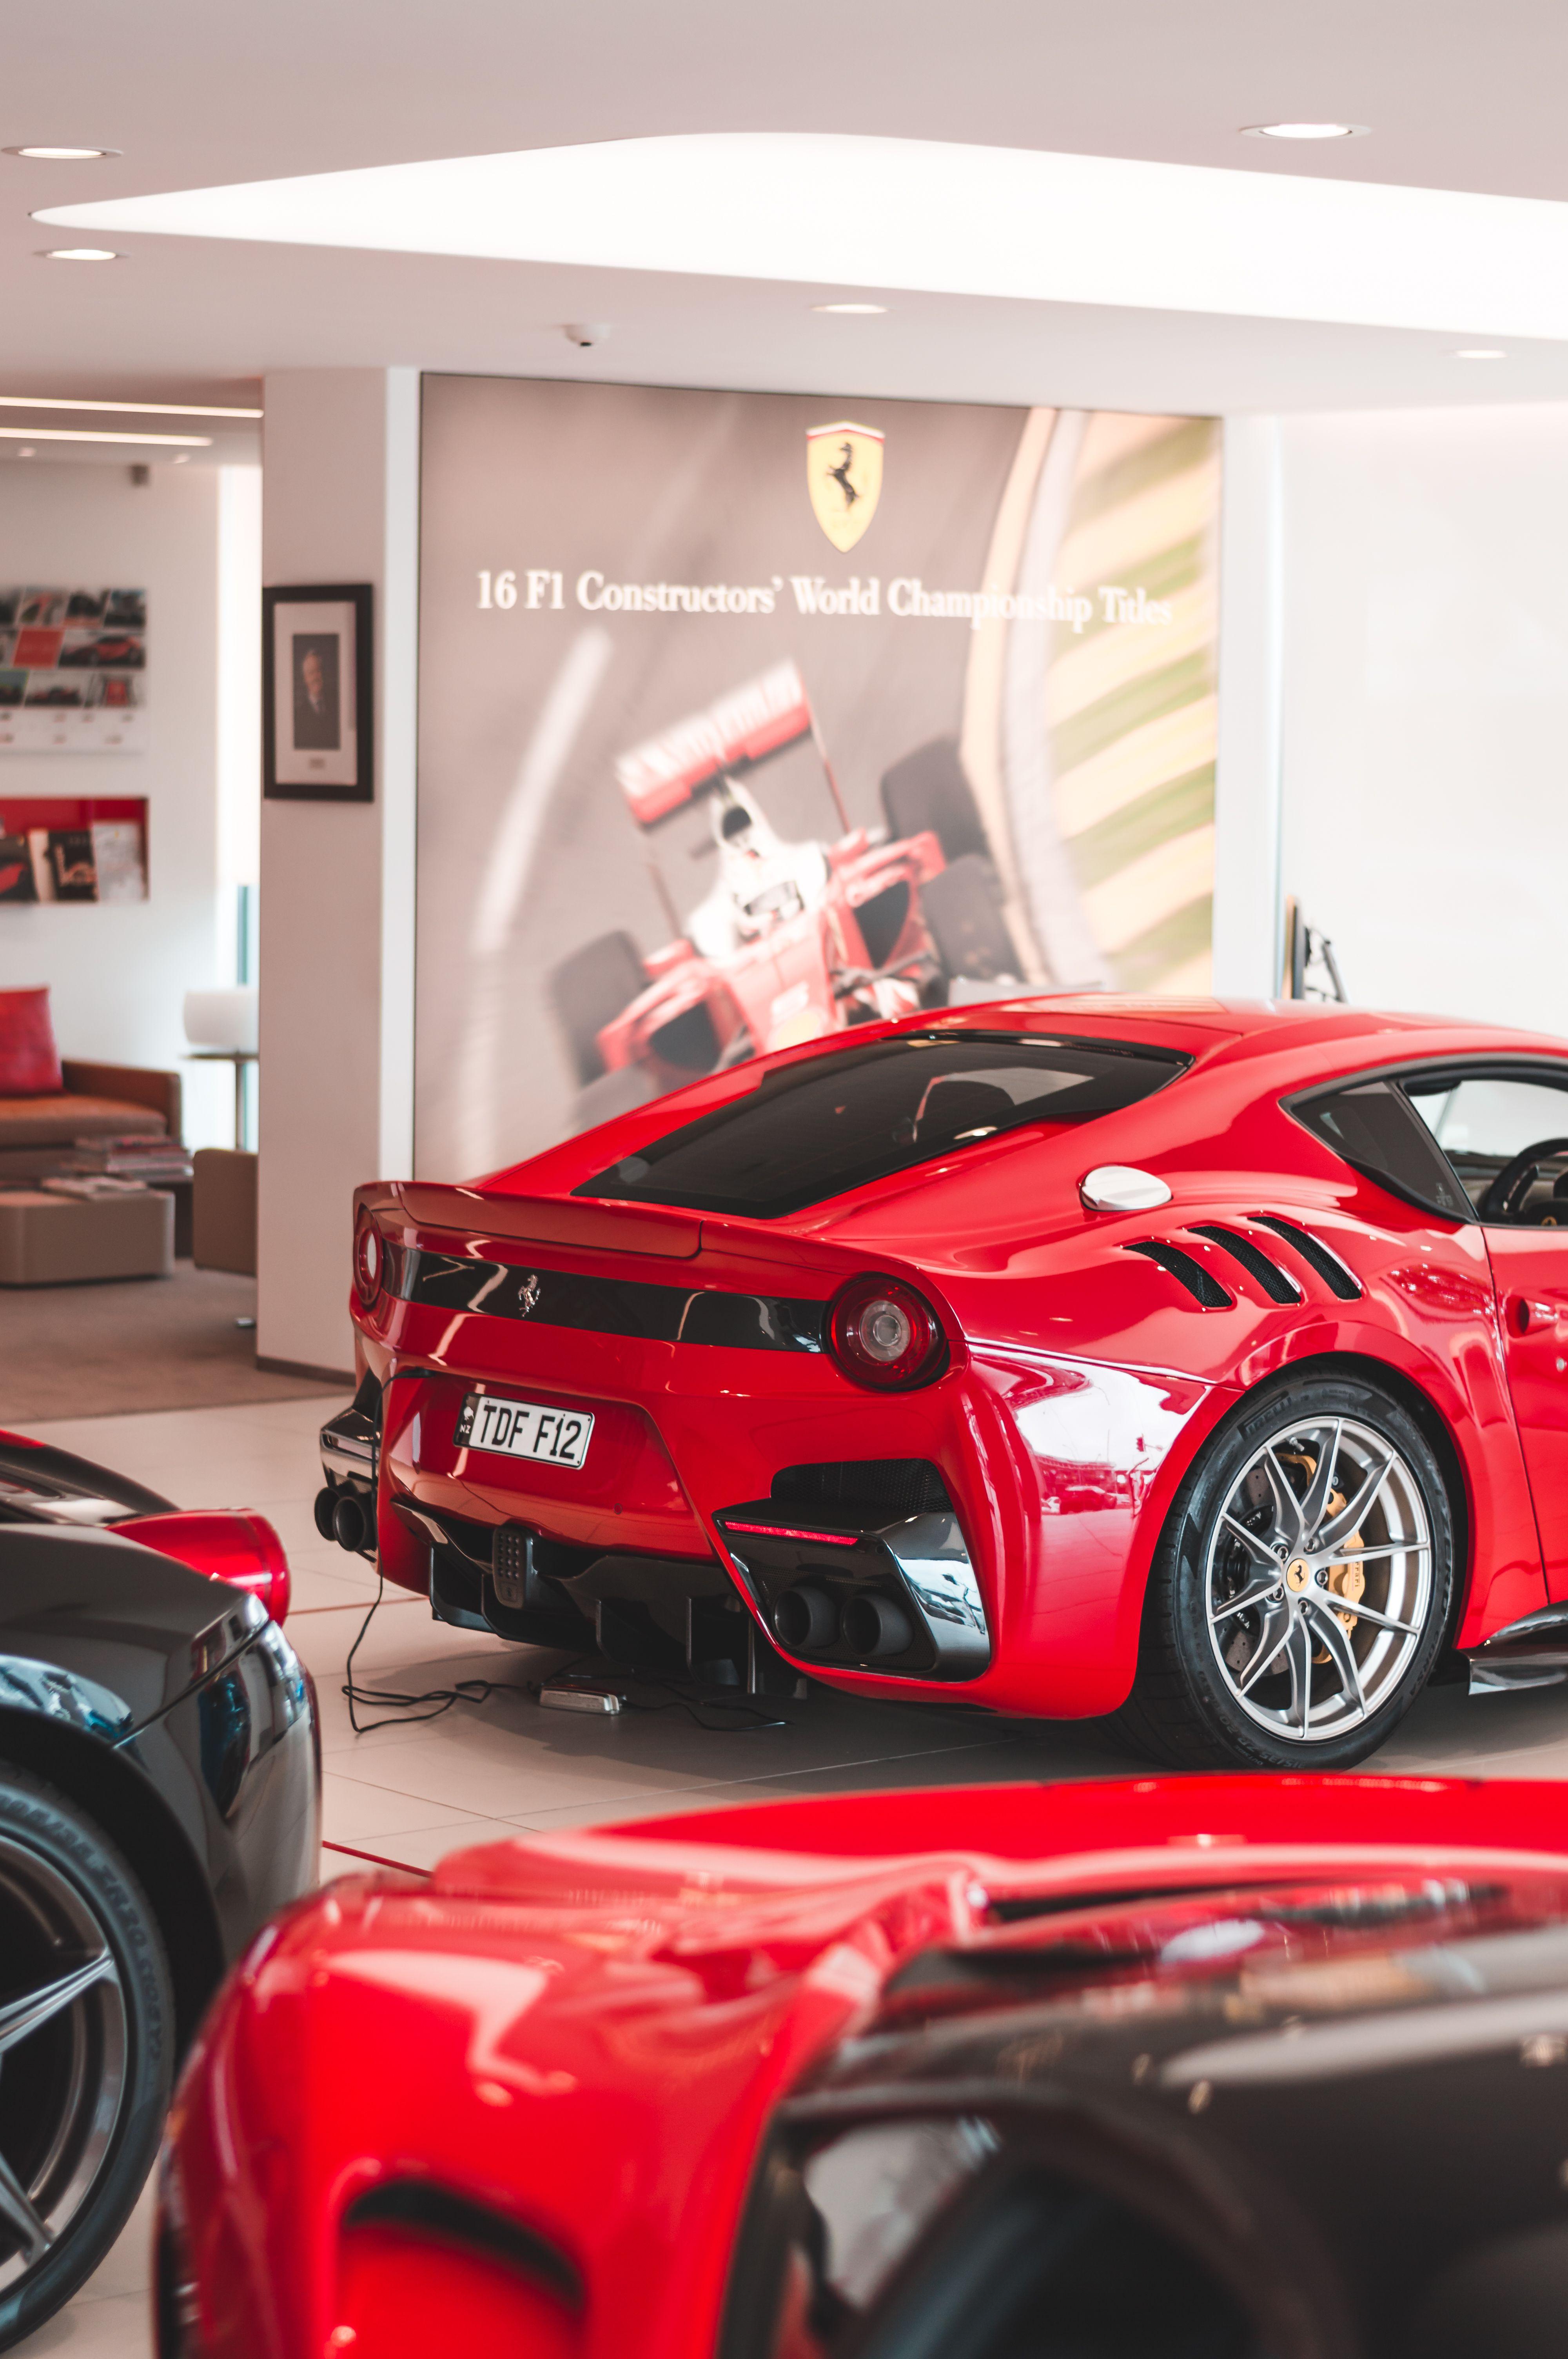 Ferrari F12 Tdf In 2020 Auto Fotografie Ferrari F12 Ferrari